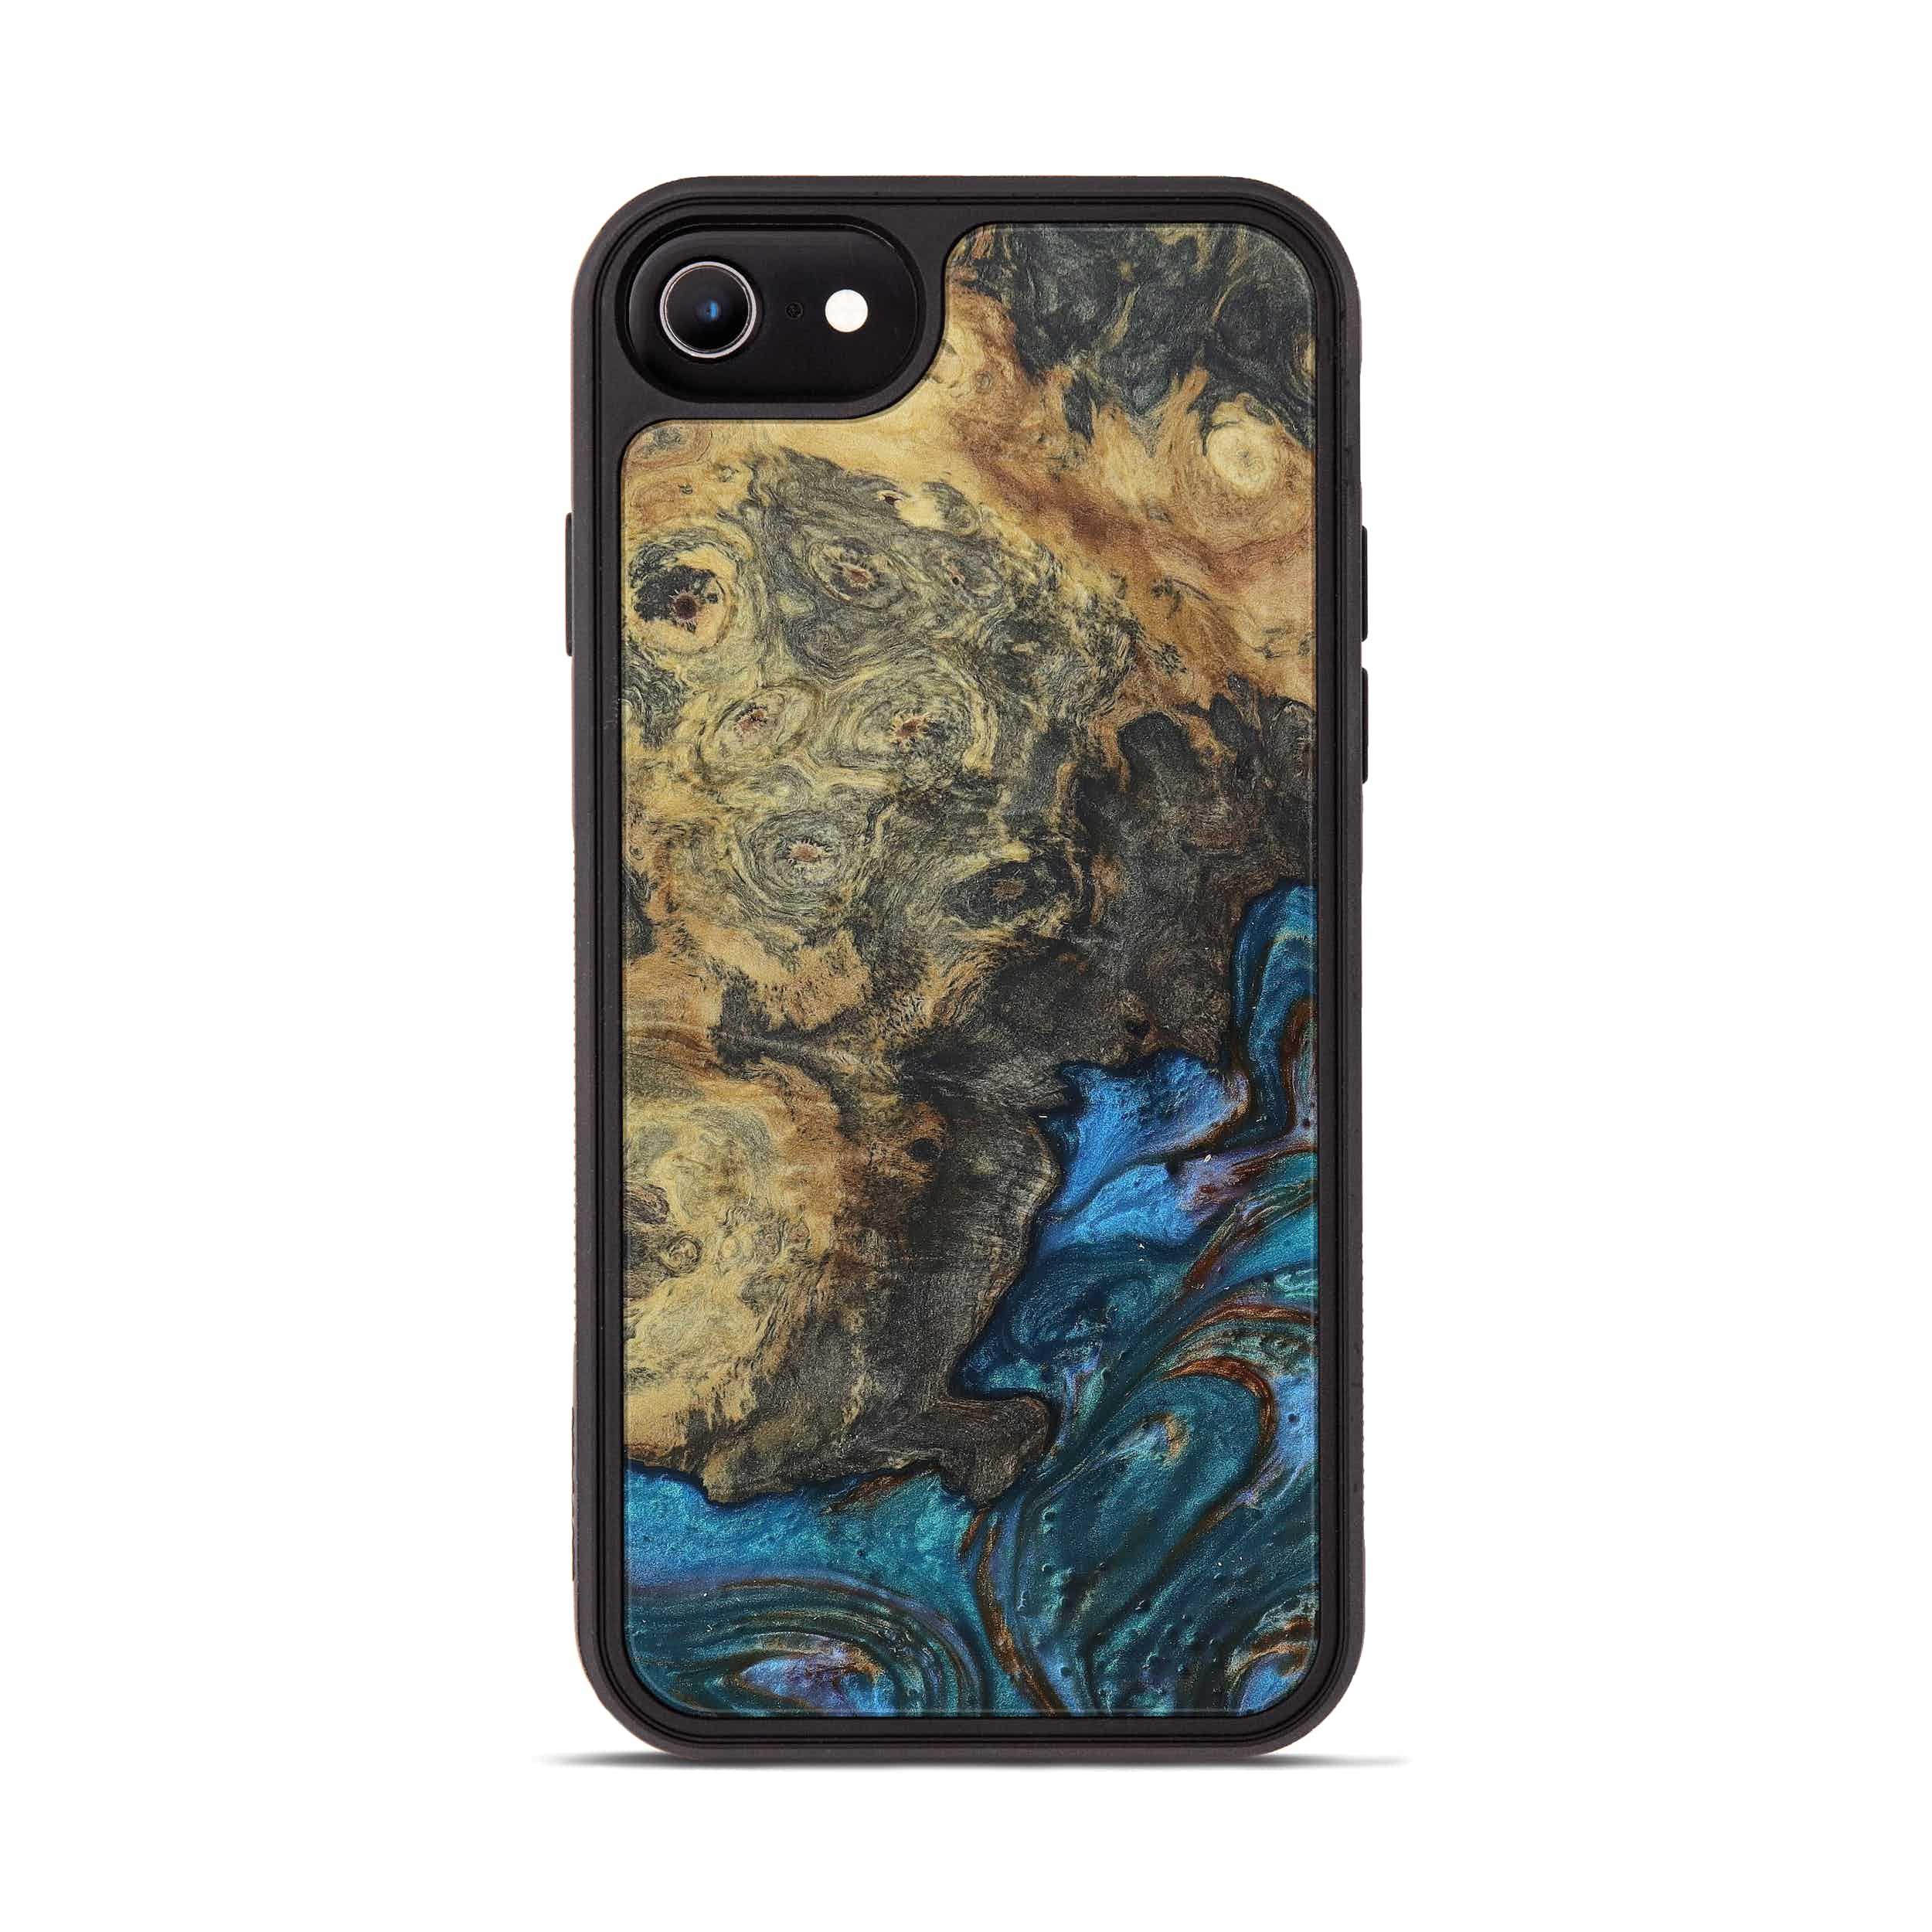 iPhone 6s Wood+Resin Phone Case - Trescha (Teal & Gold, 397266)